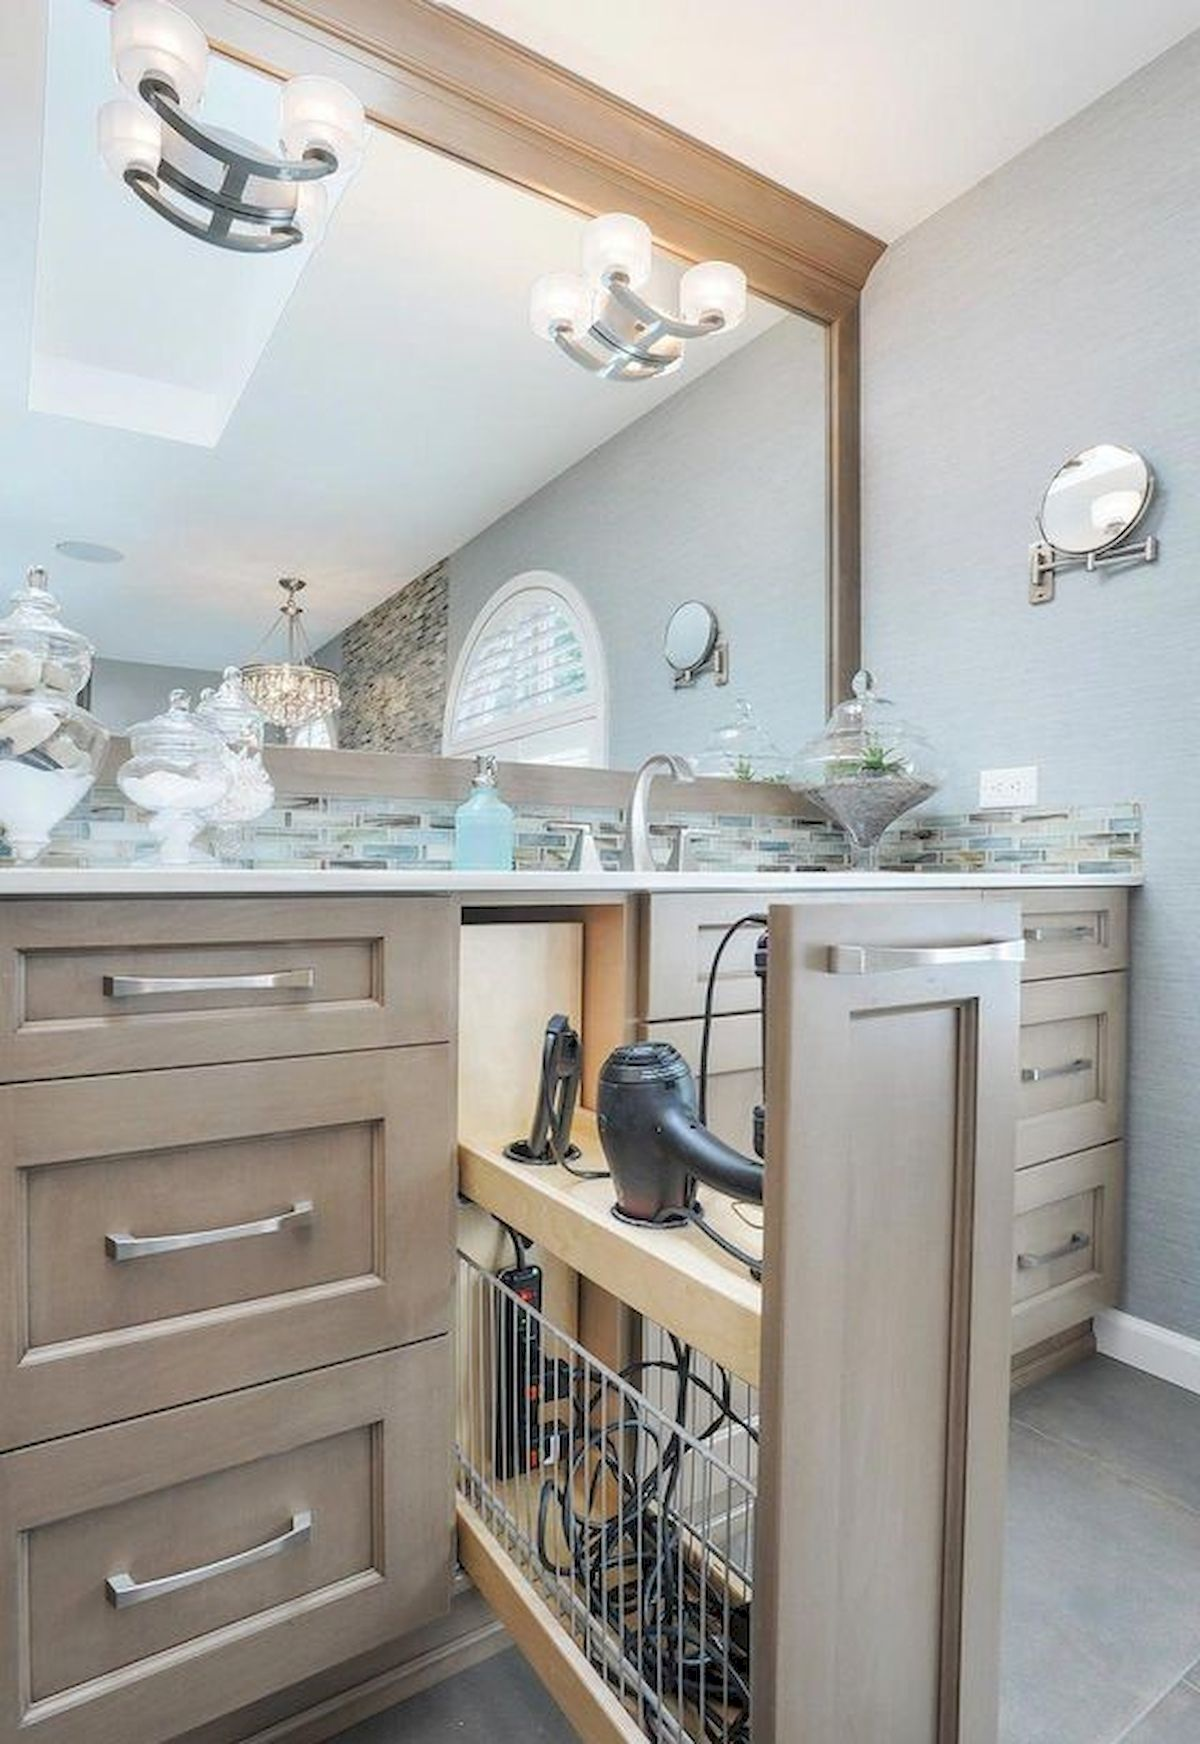 33 Fantastic Bathroom Storage Decor Ideas And Remodel #dreambathrooms